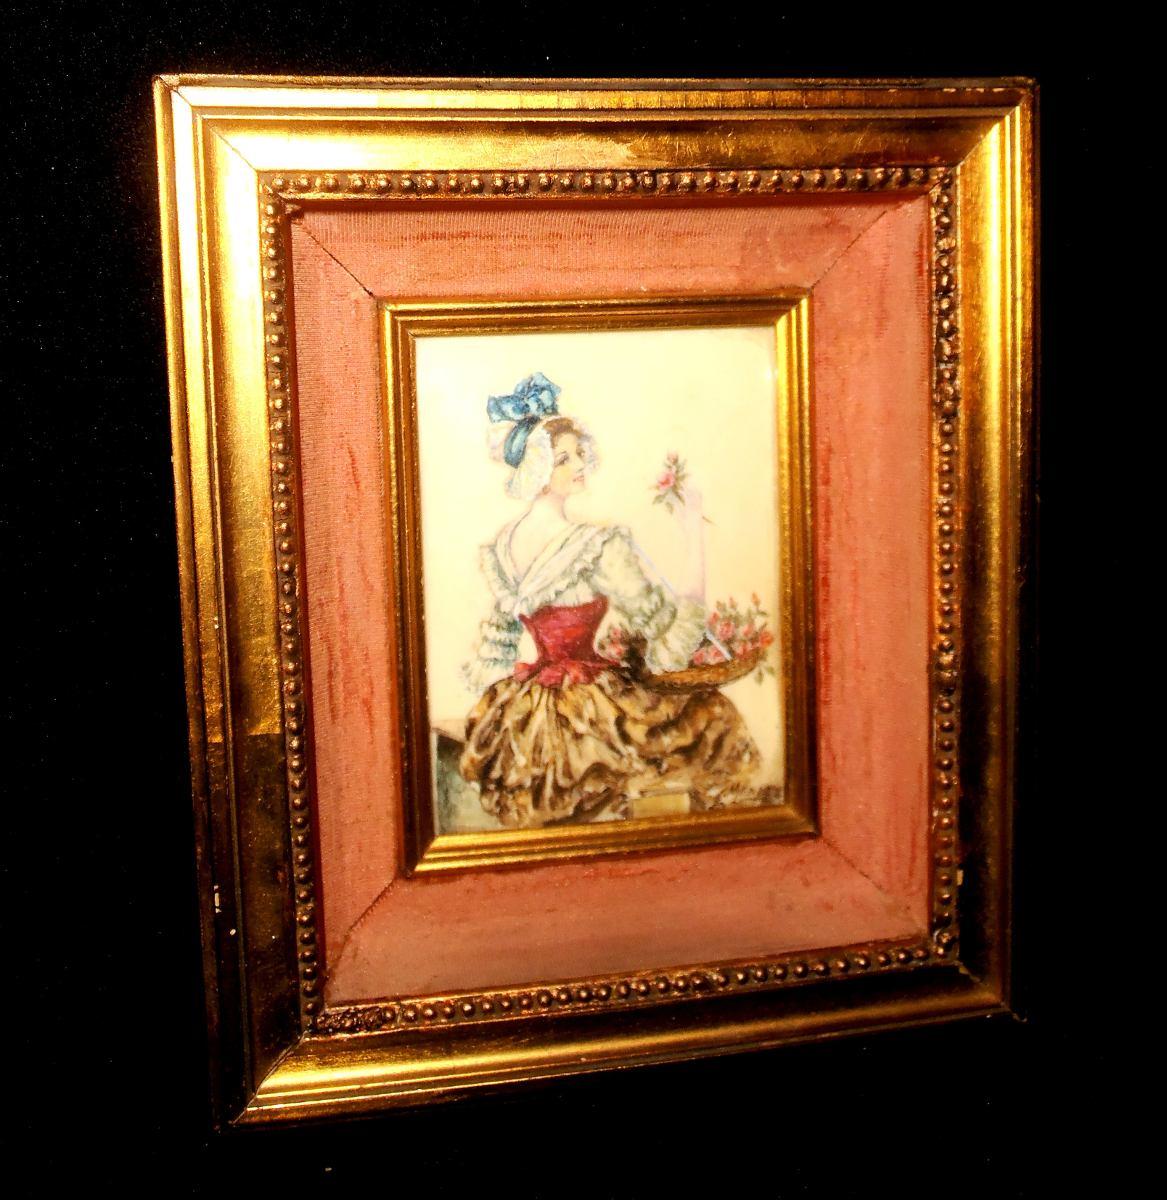 Cuadro Camafeo Pintura Original Material Noble Marco Dorado ...